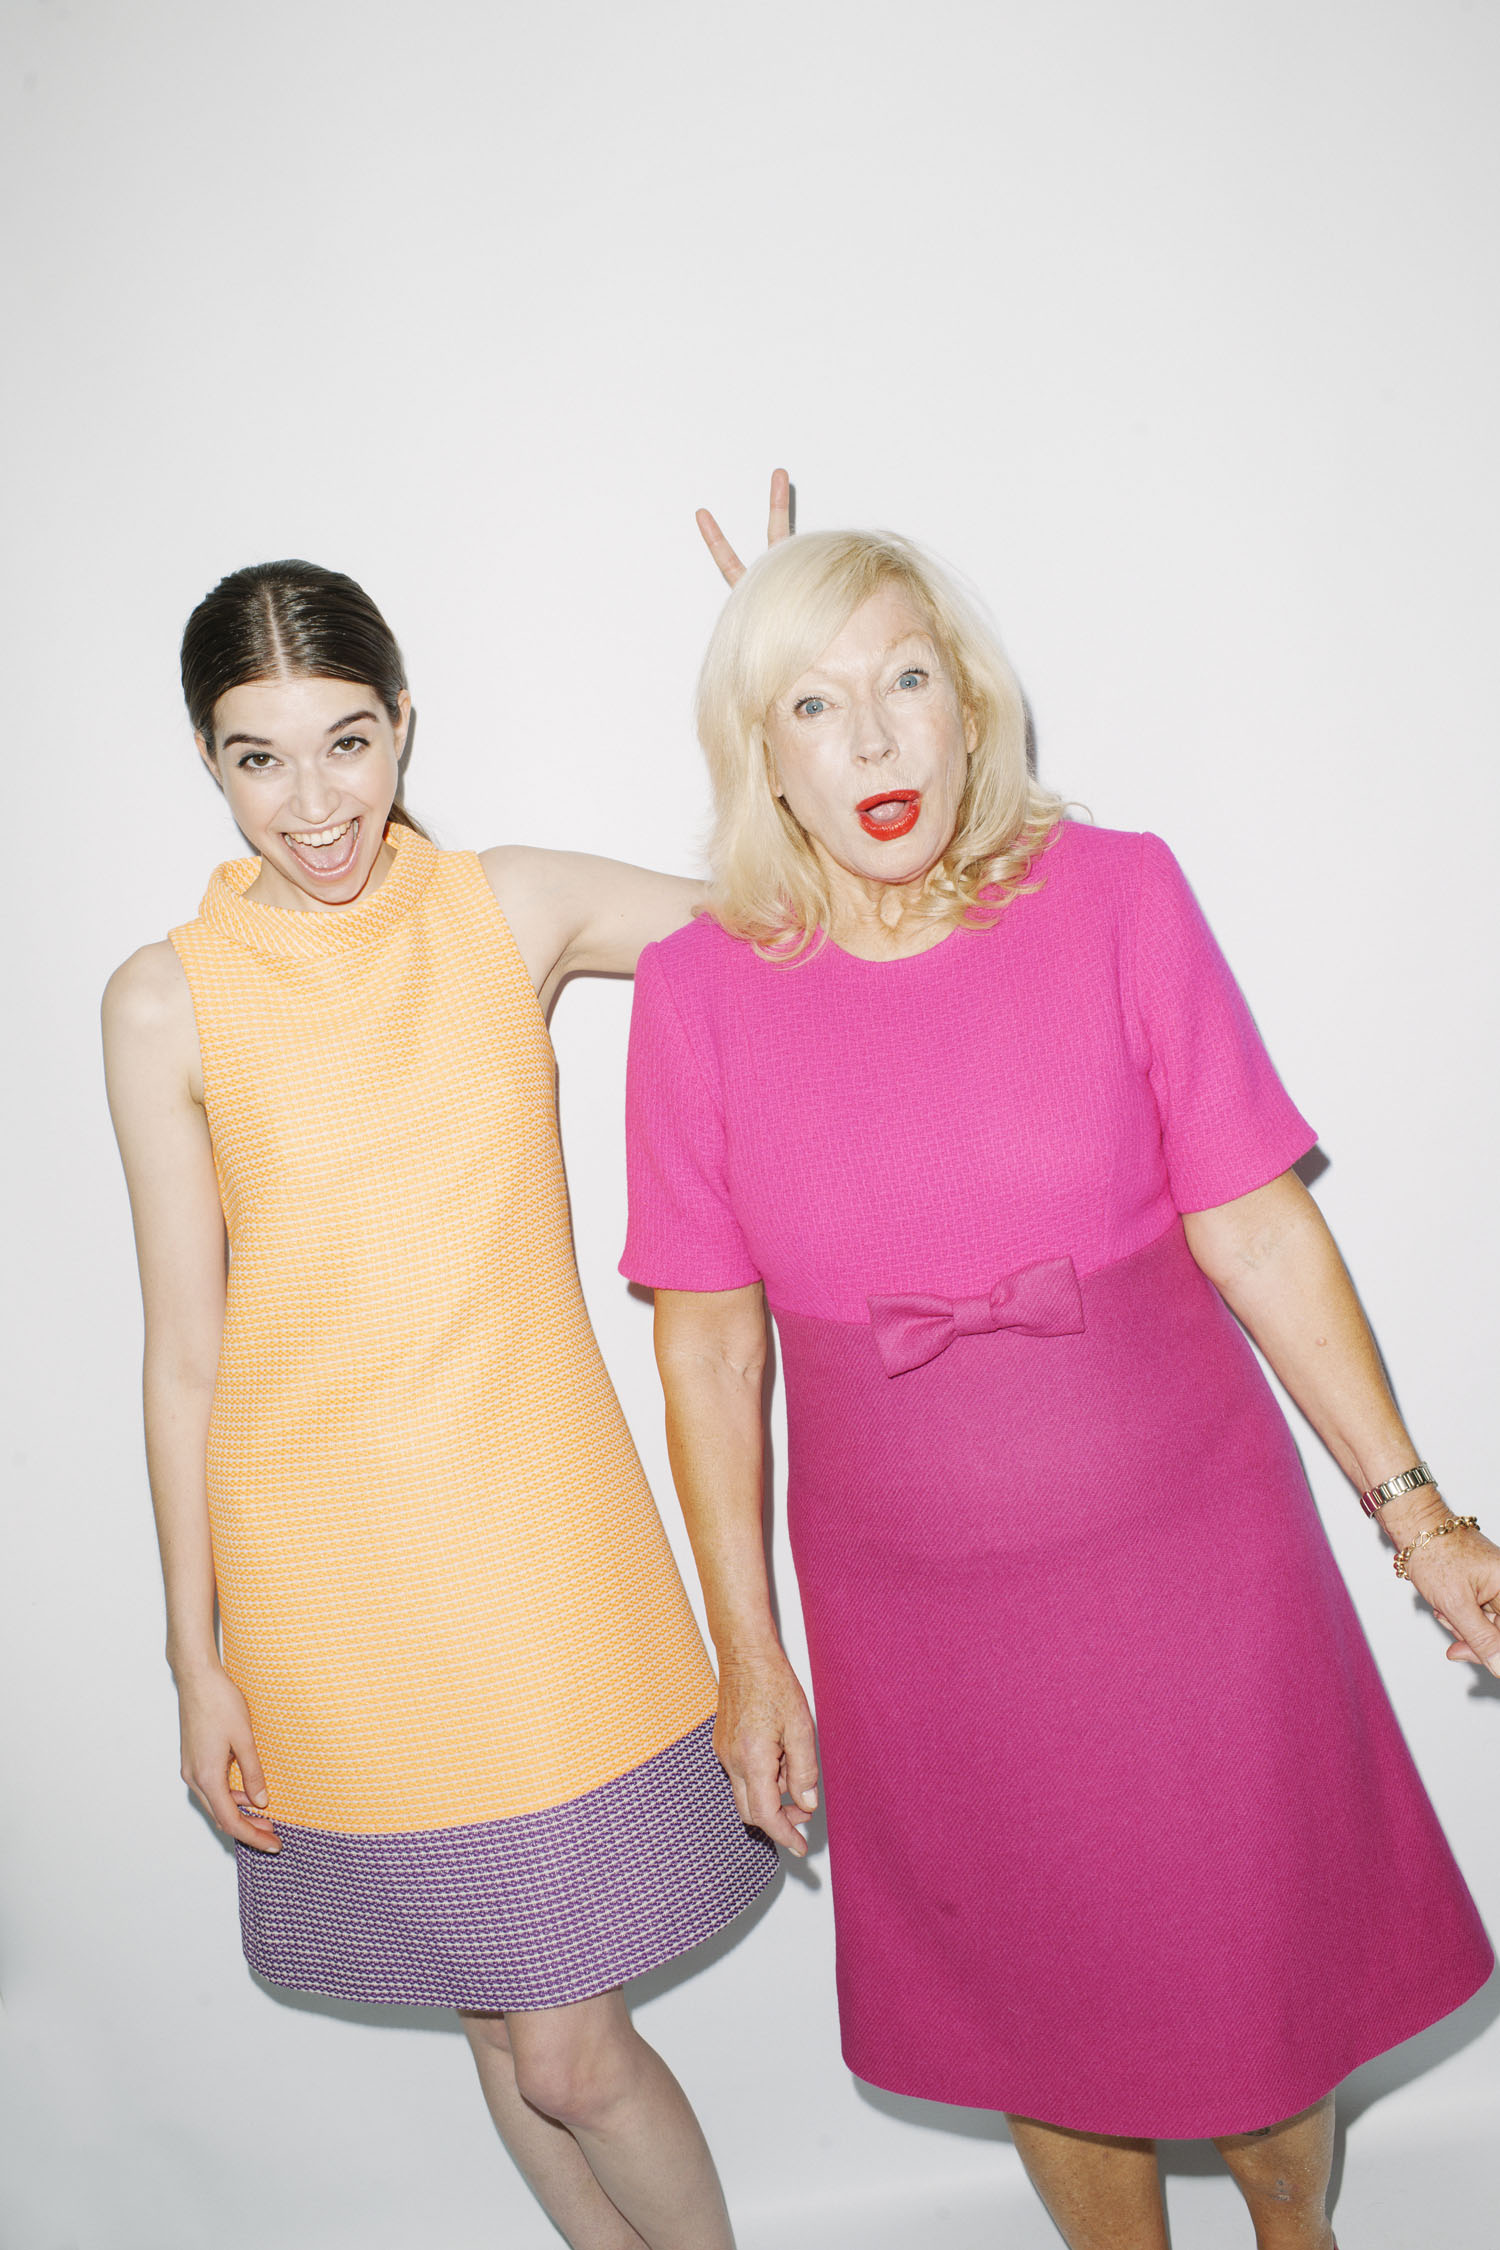 AW13: A Yellow Wool Dress with a Clashing Purple Trim